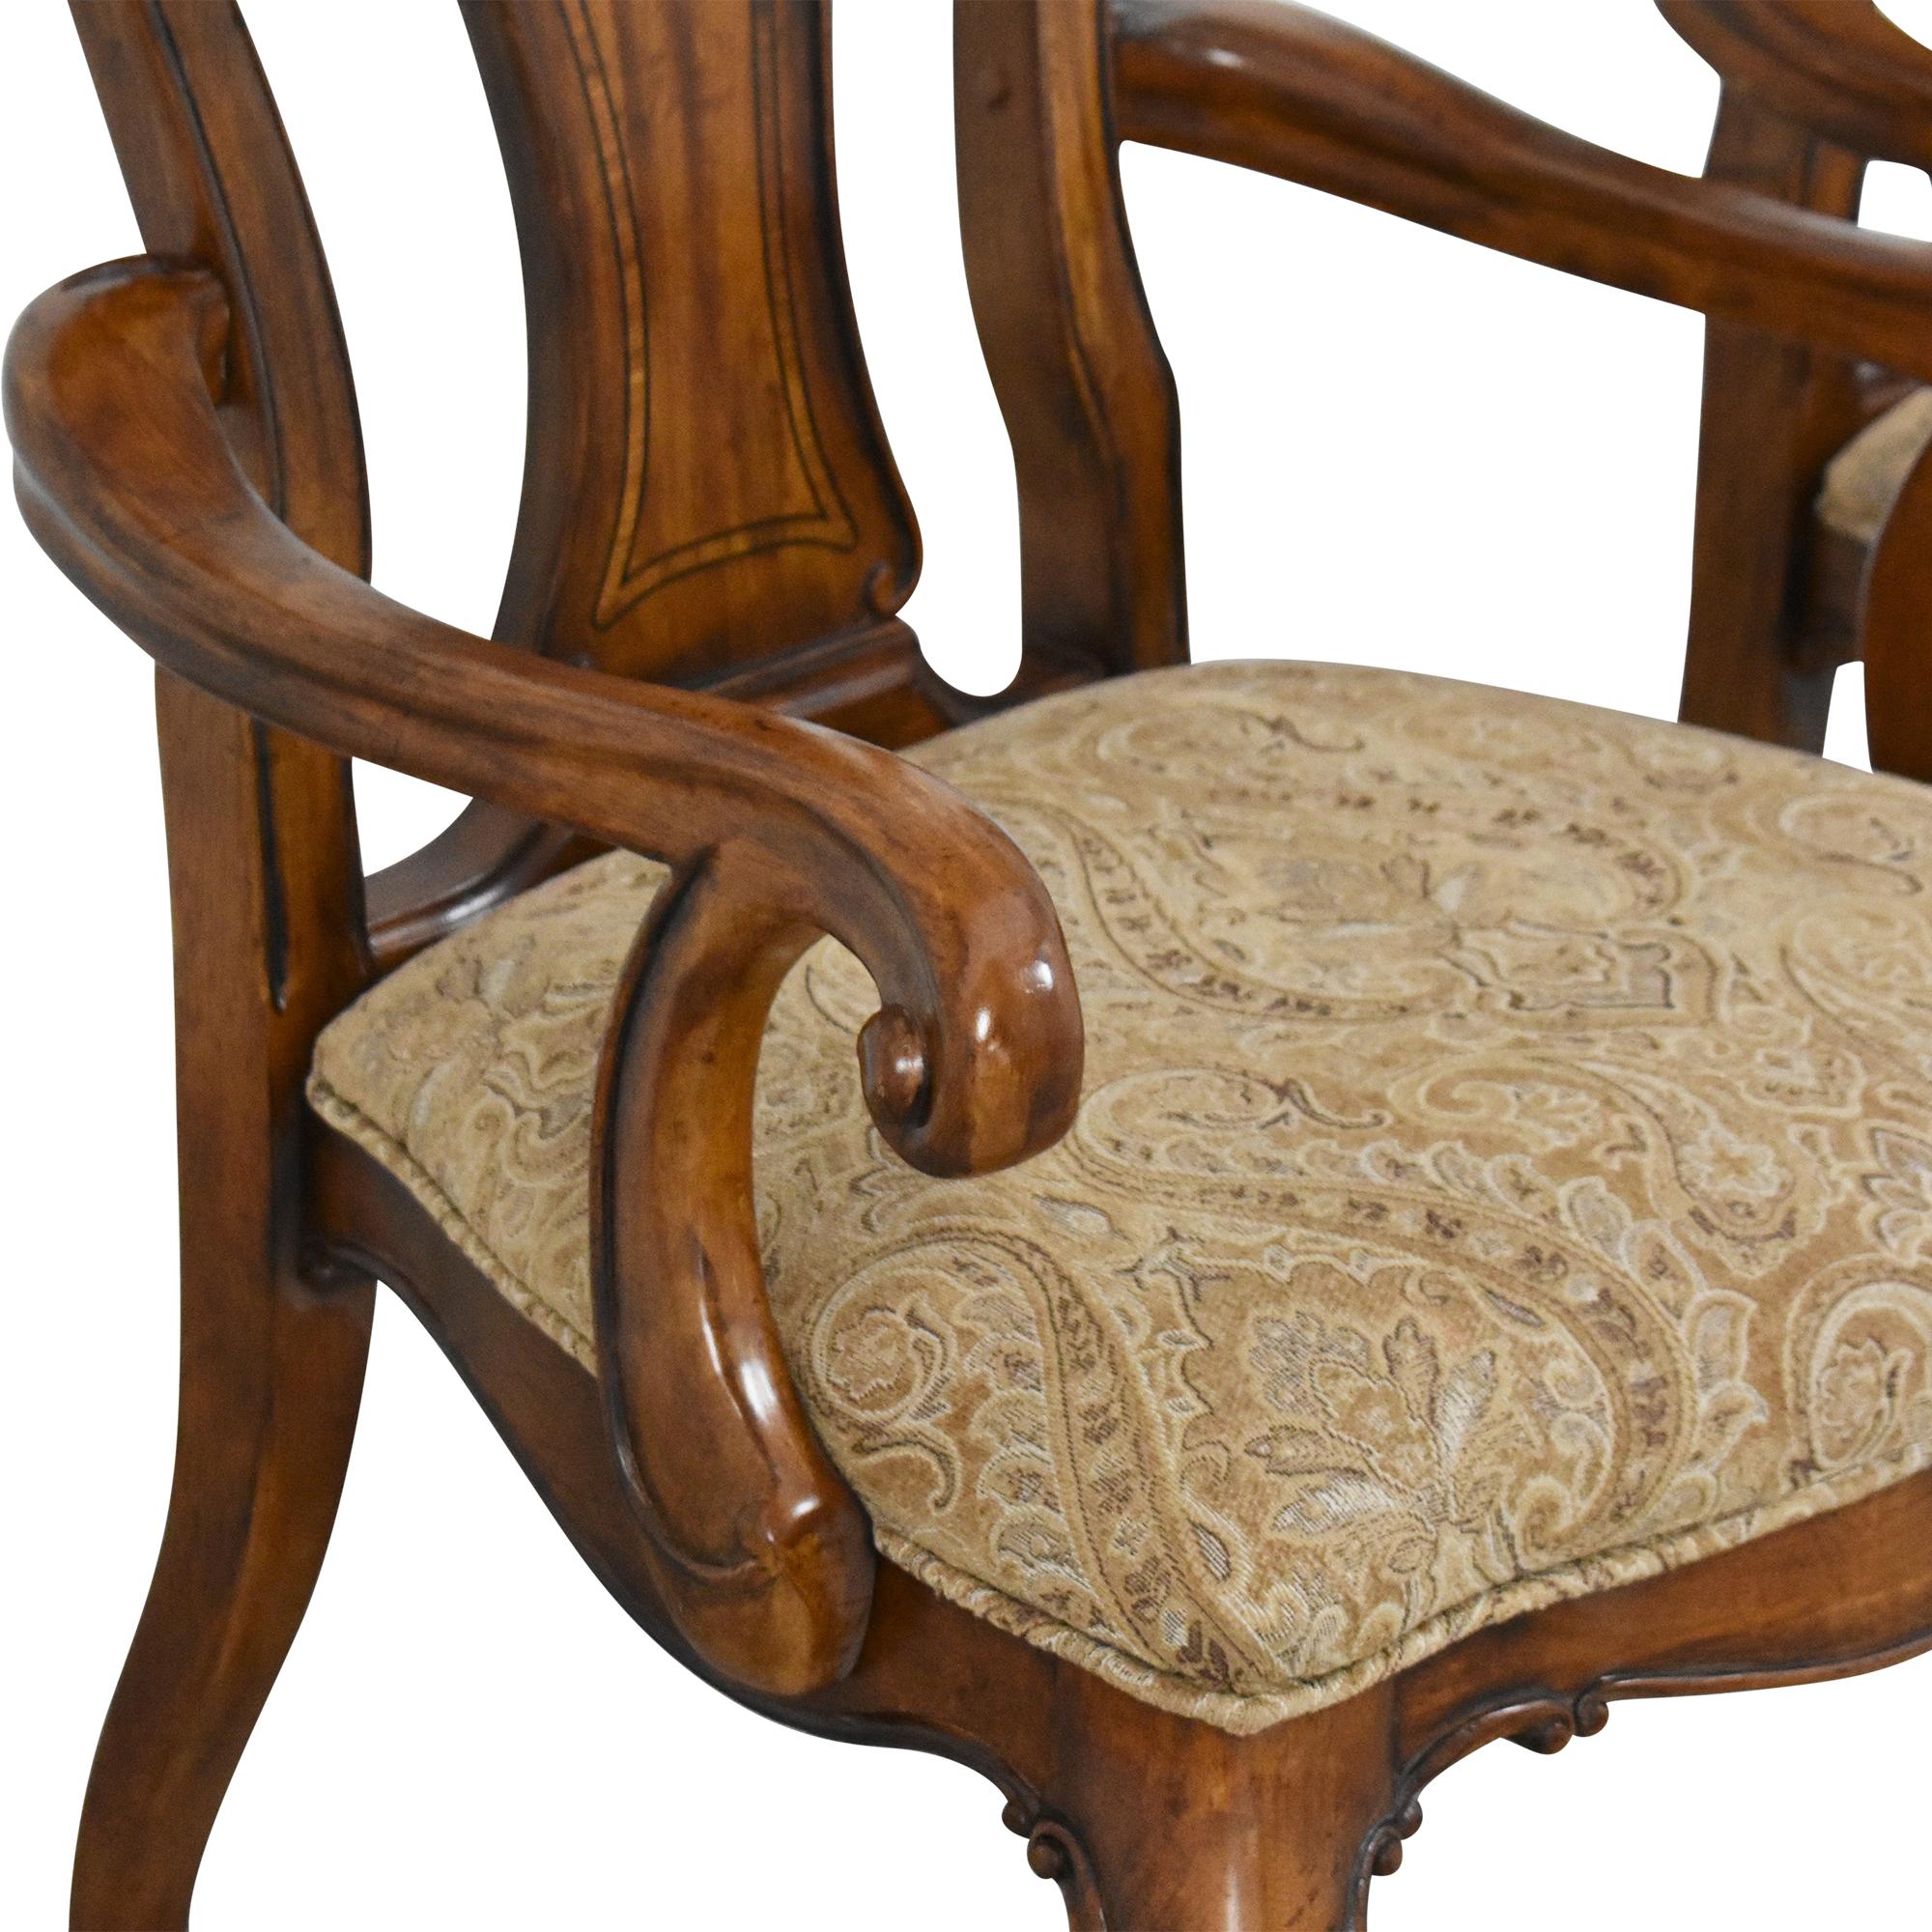 Thomasville Ernest Hemingway Granada Dining Arm Chairs Thomasville